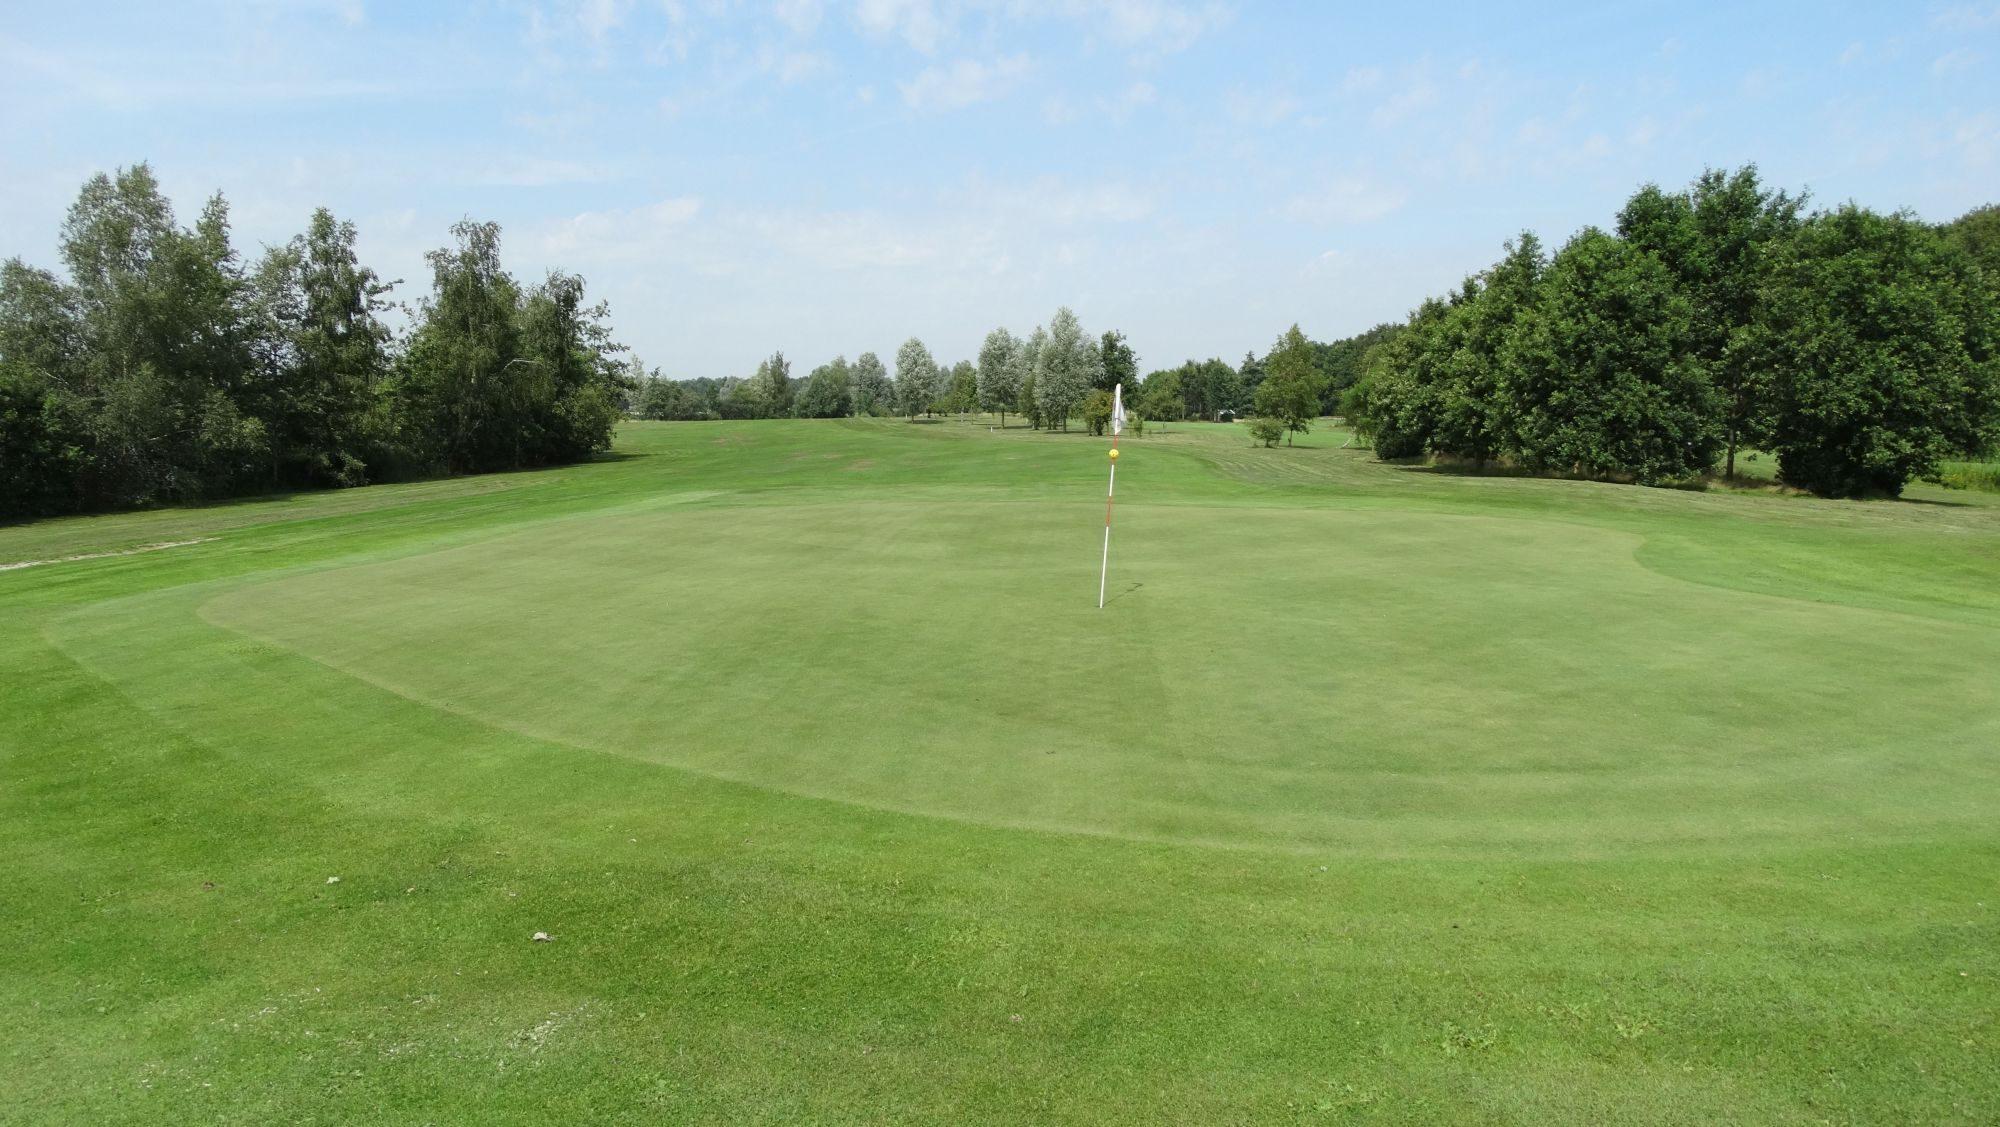 De golfbaan van Golfclub Heidemeer